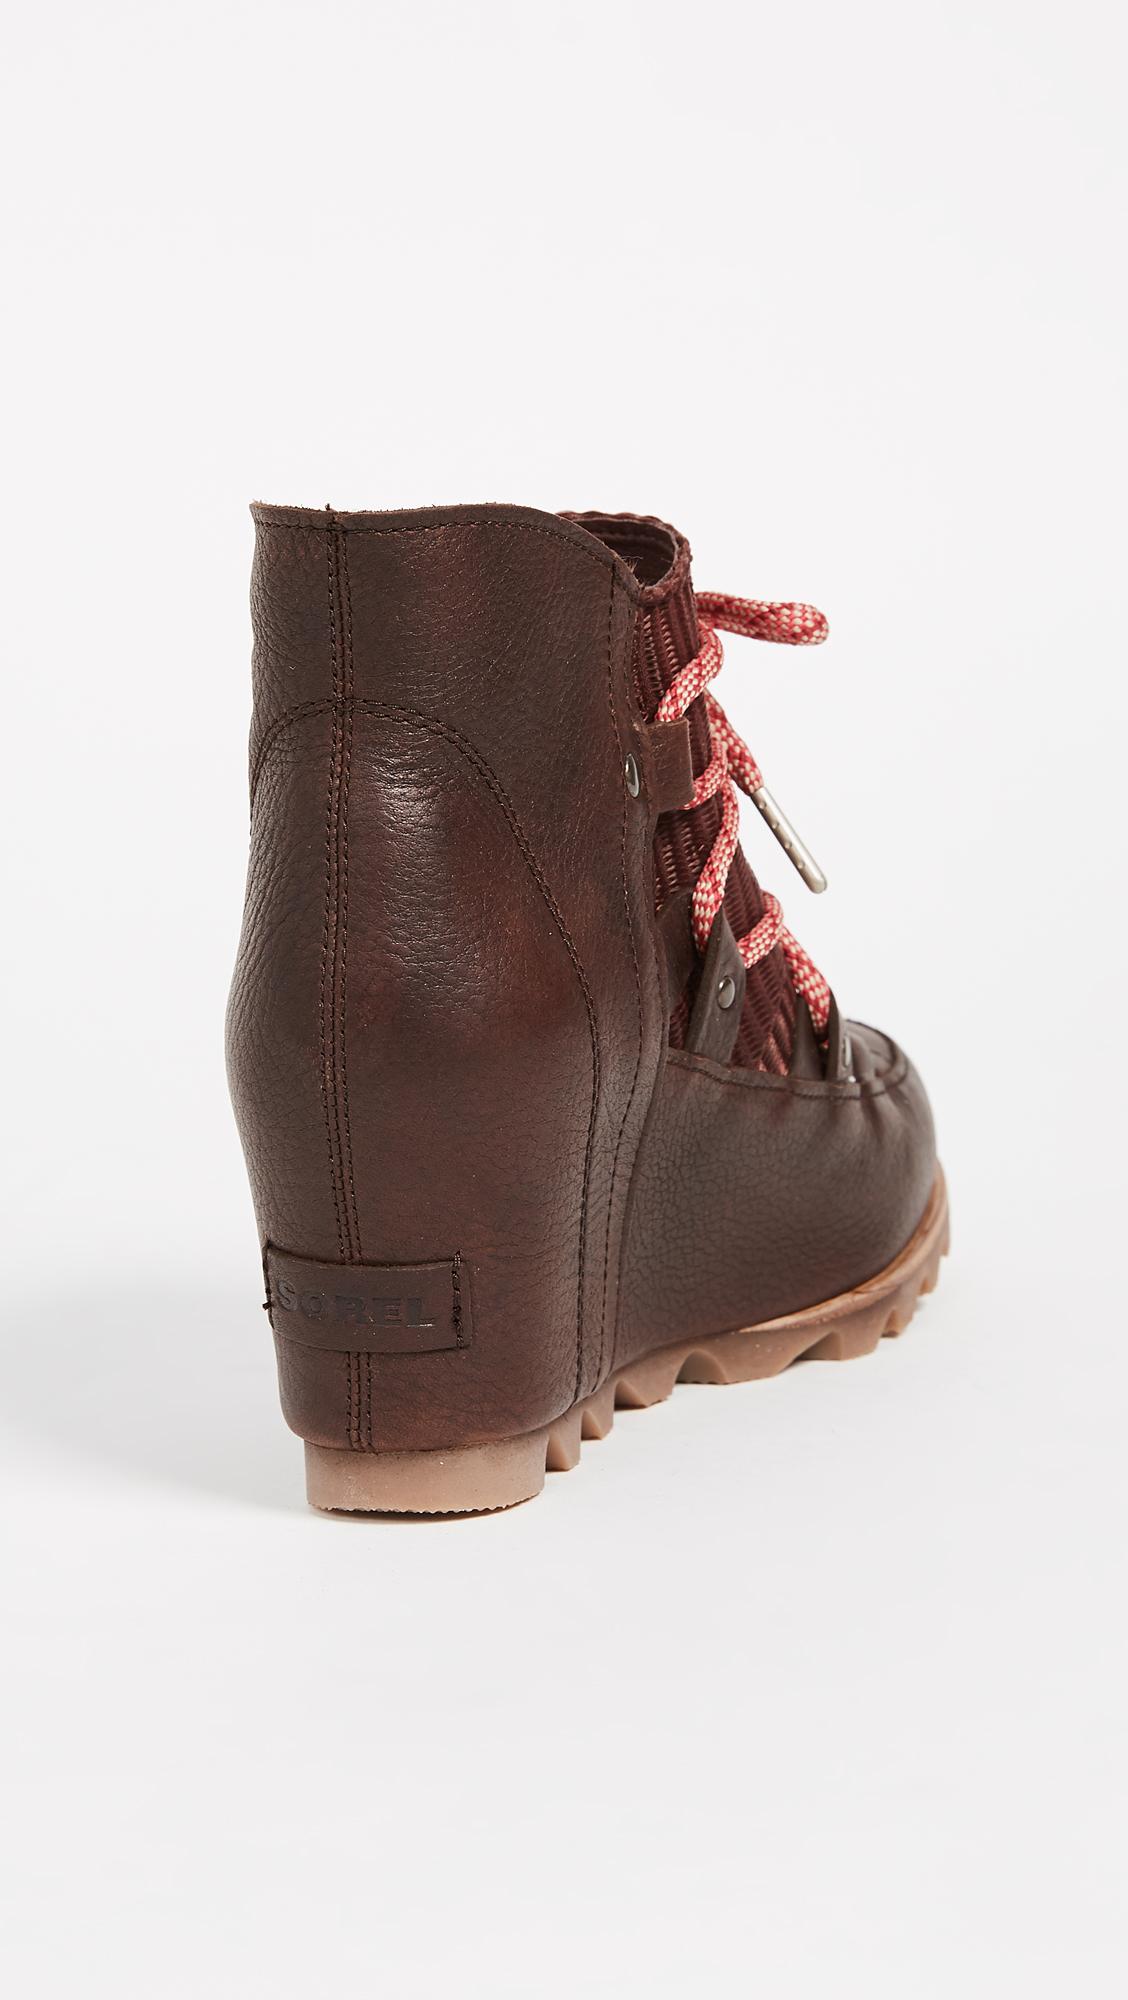 Sorel Sandy Wedge Booties Shopbop D Island Shoes Style Hikers Dm Mens Leather Cokelat